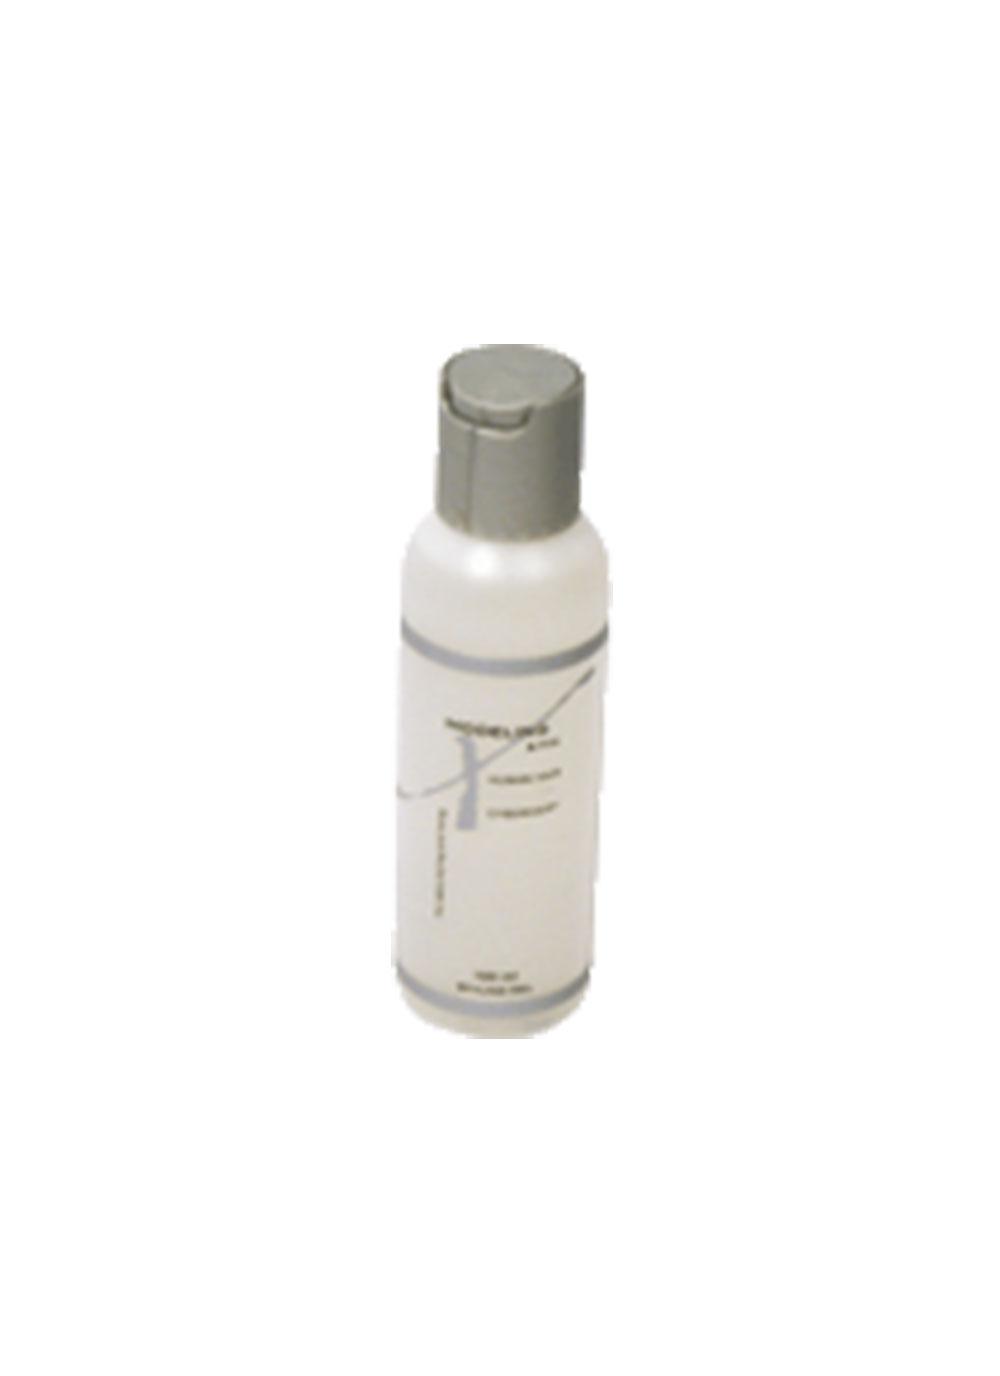 Fancy Hair Zubehör - Mix Hair Modeling & Fix Styling Gel Echthaar 100ml